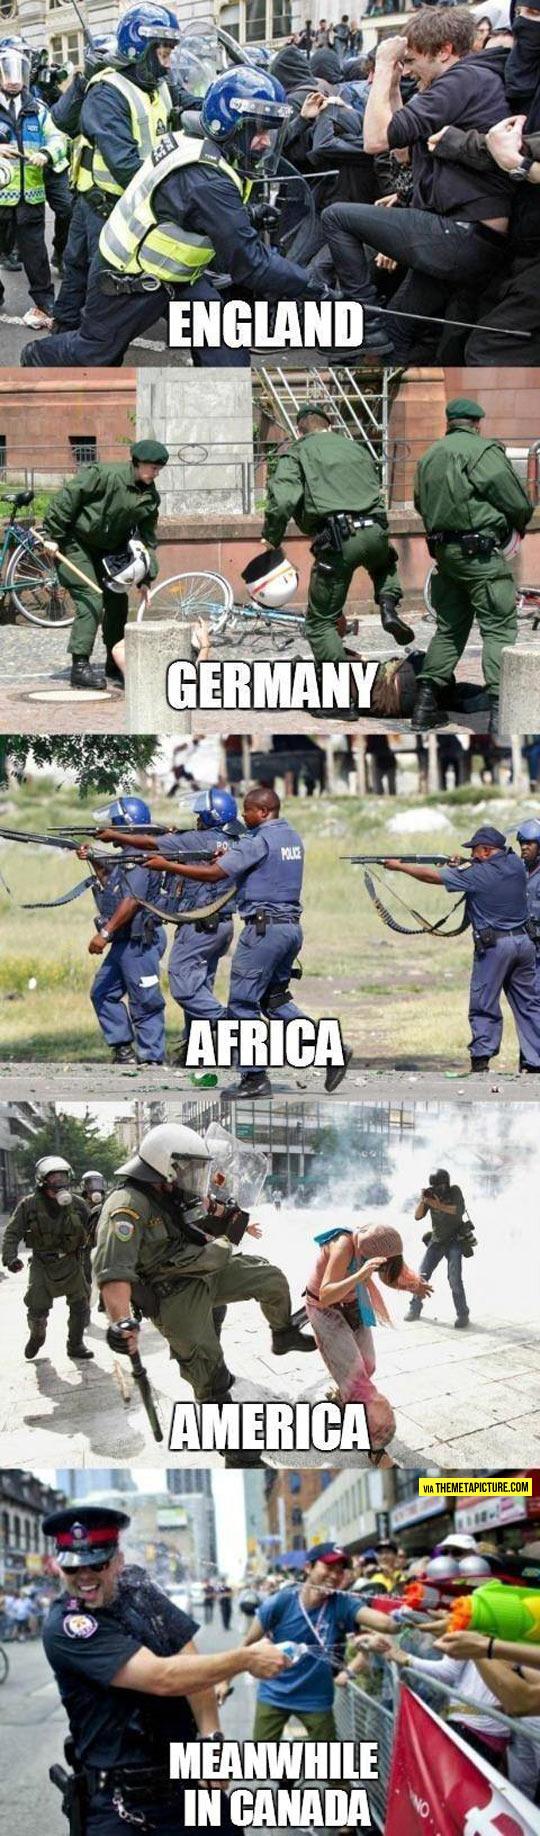 Police Behavior Across The World